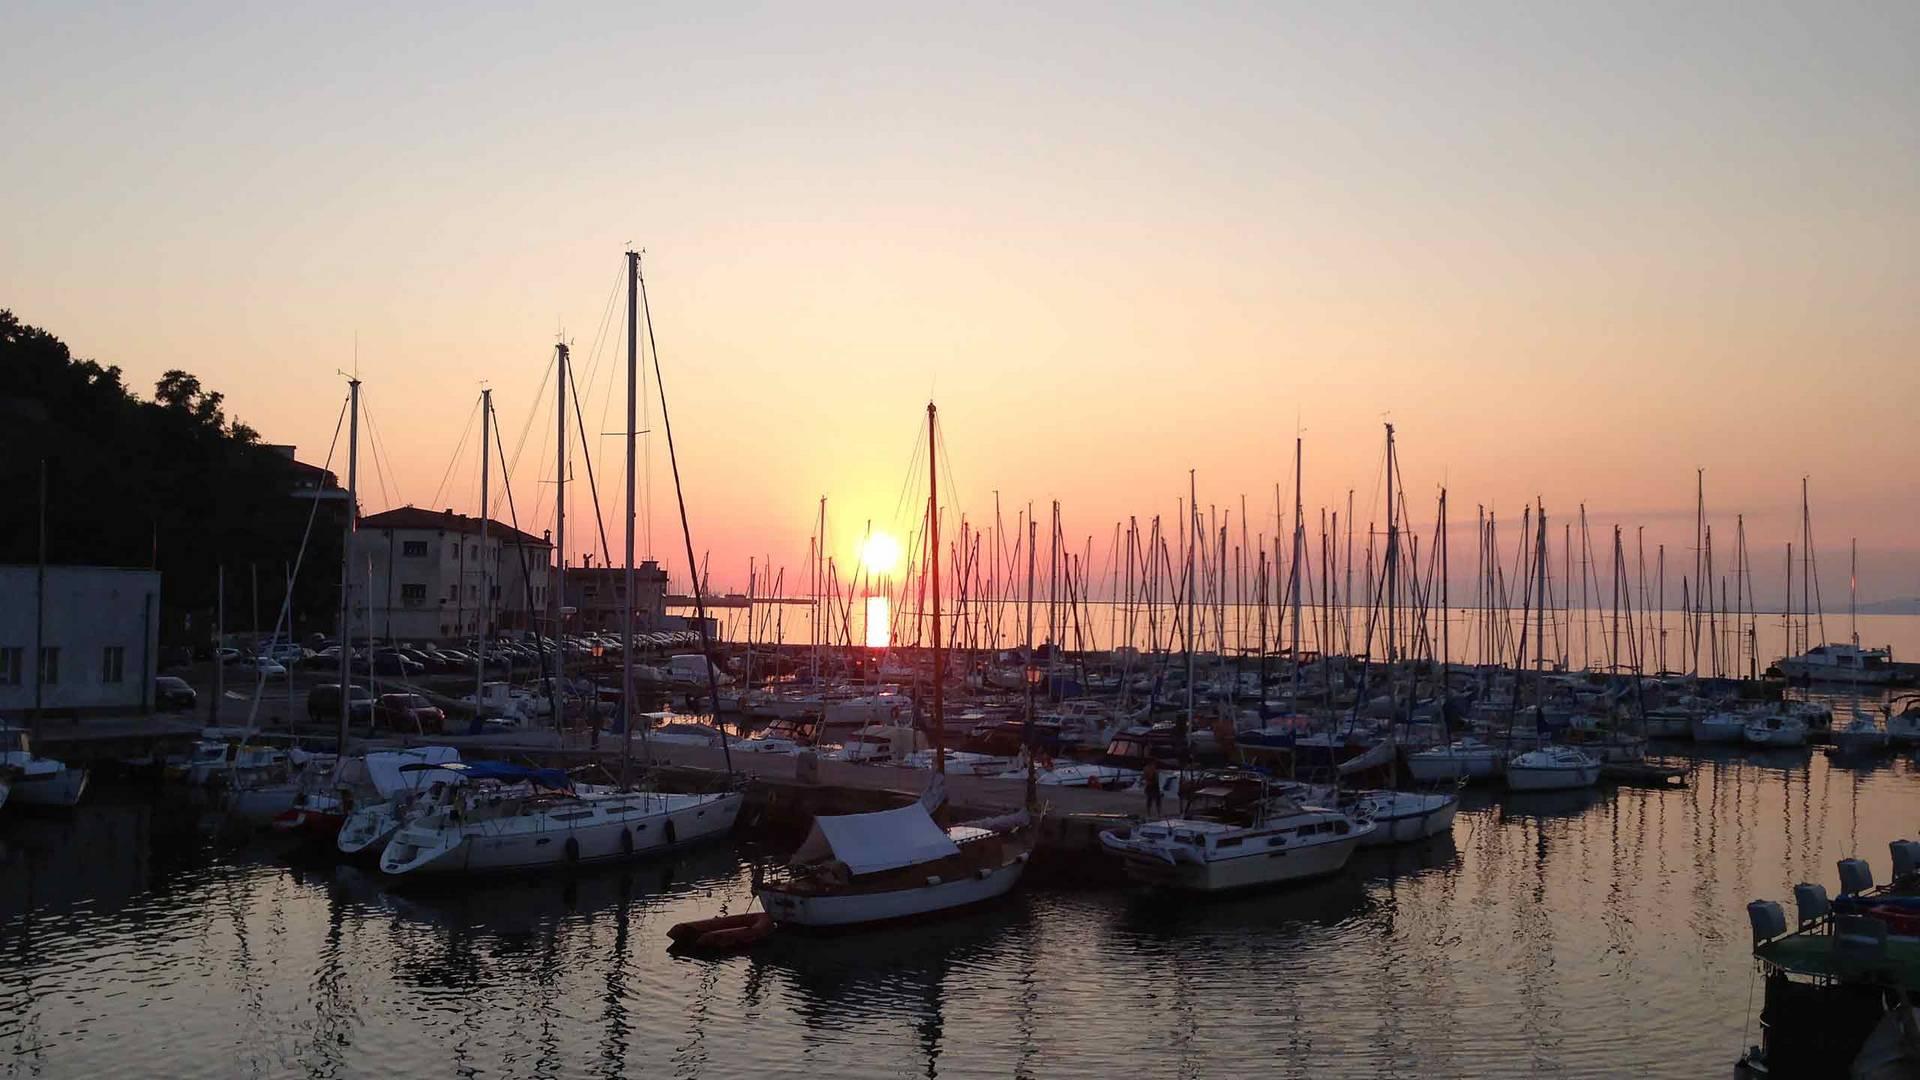 Sonnenuntergang in Muggia